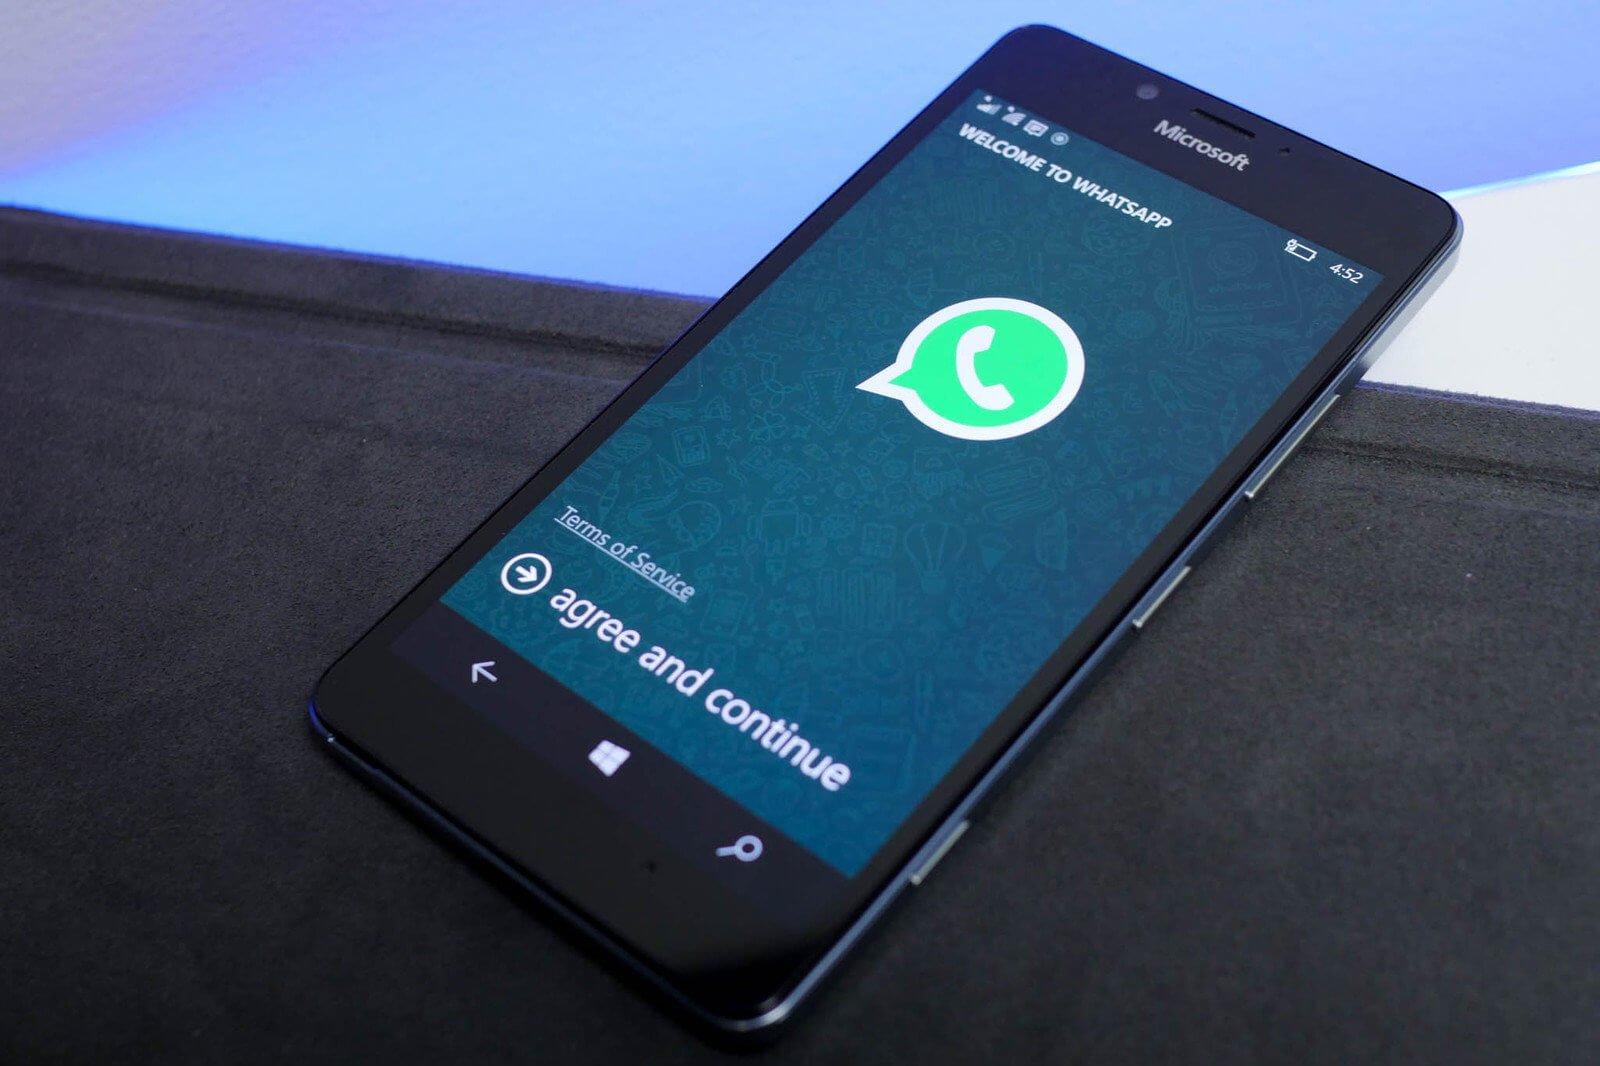 WhatsApp'ta Para Transfer Dönemi Çok Yakında Geliyor WhatsApp'ta Para Transfer Dönemi Çok Yakında Geliyor whatsapp